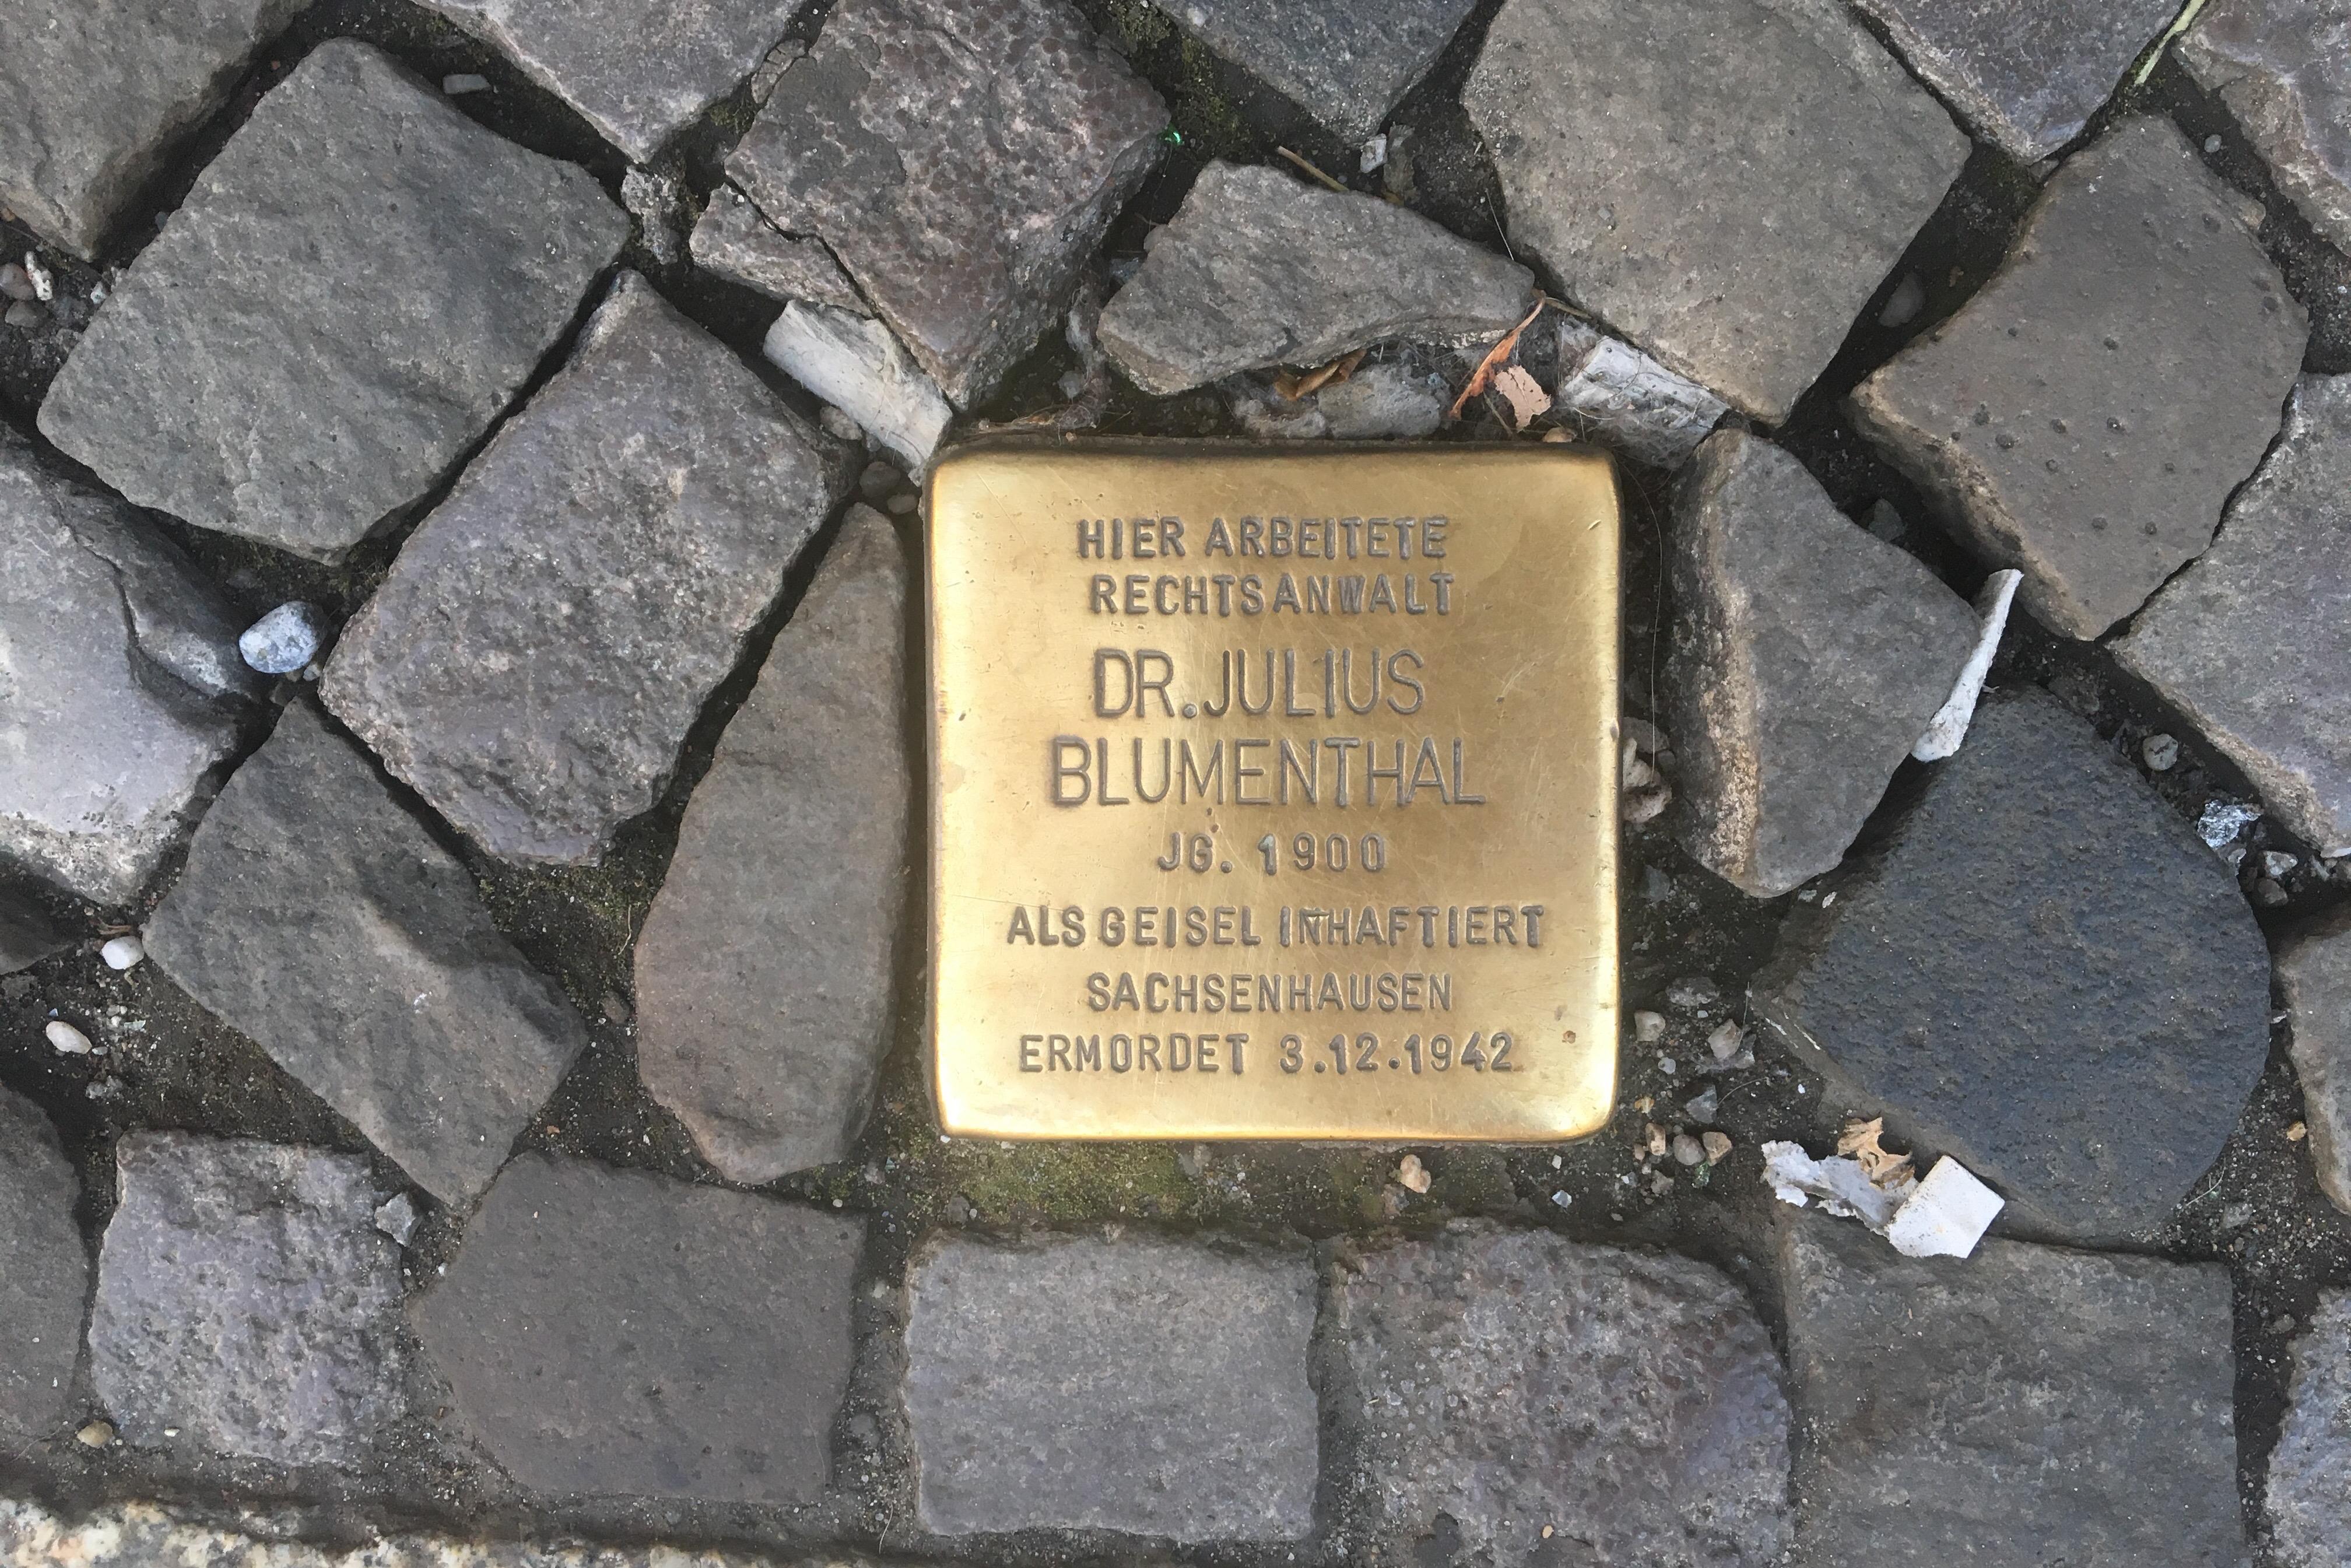 Yndlingssteder i Berlin, Stolpersteine